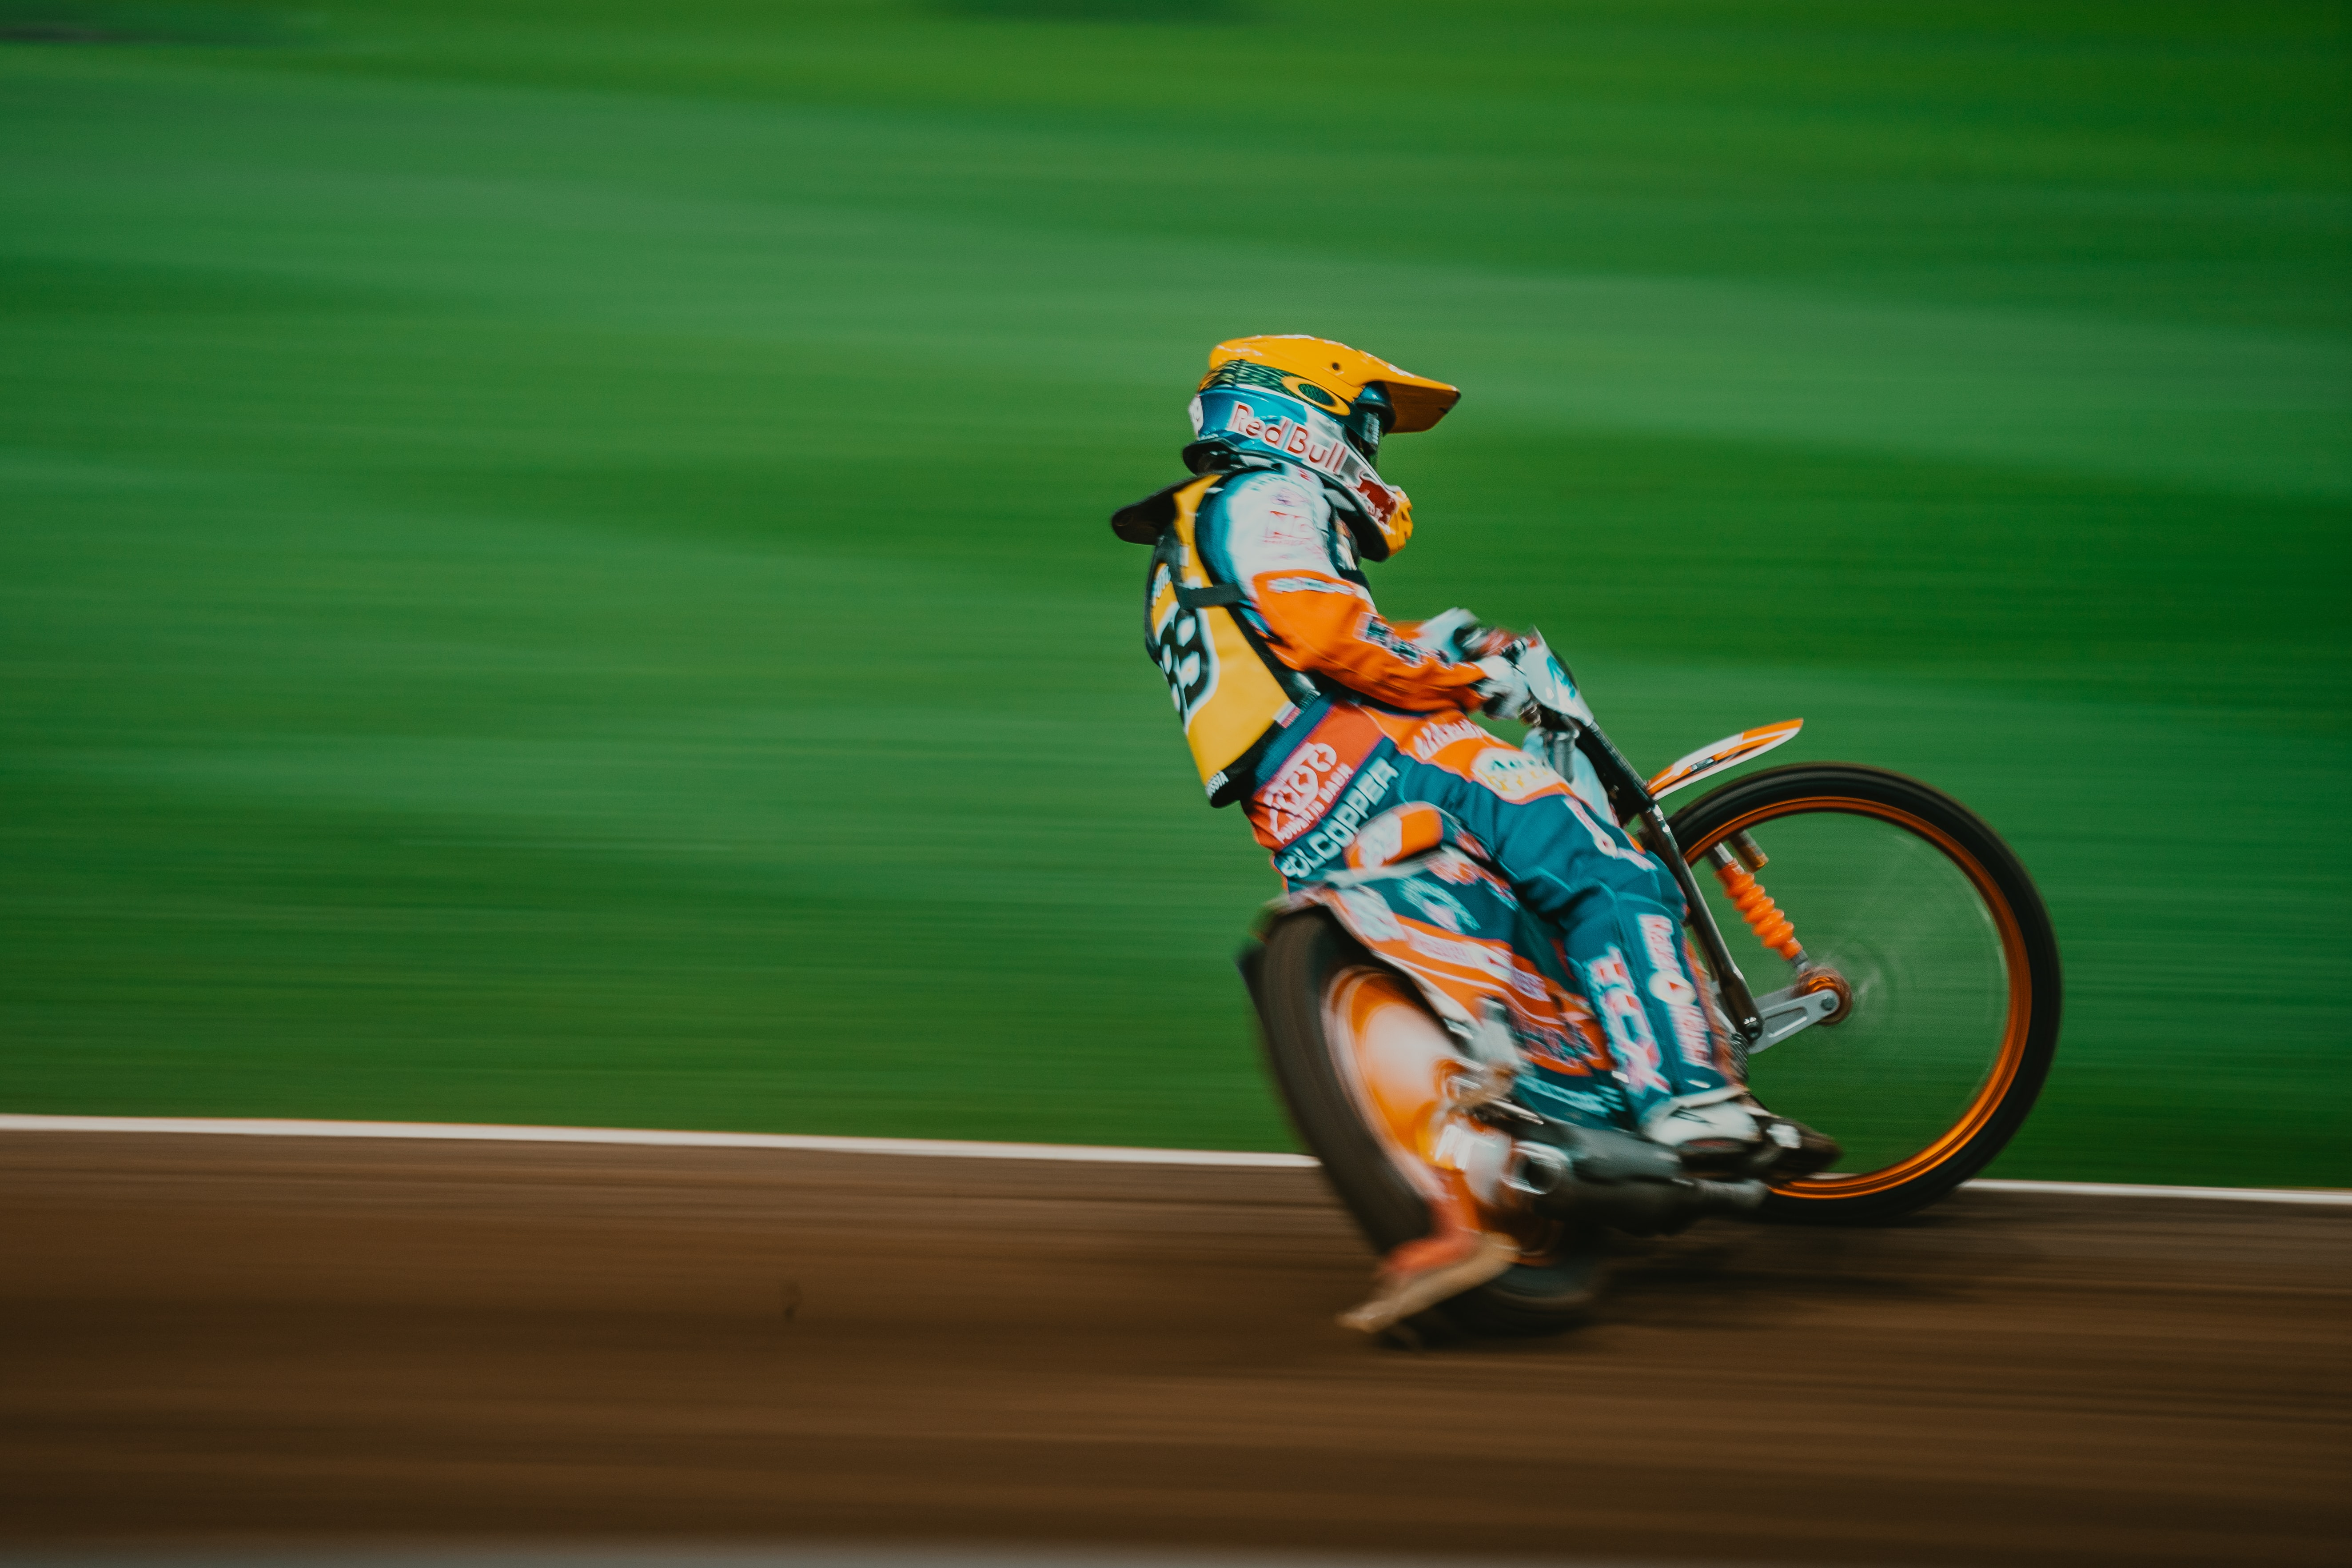 man riding motocross bike on panning photography